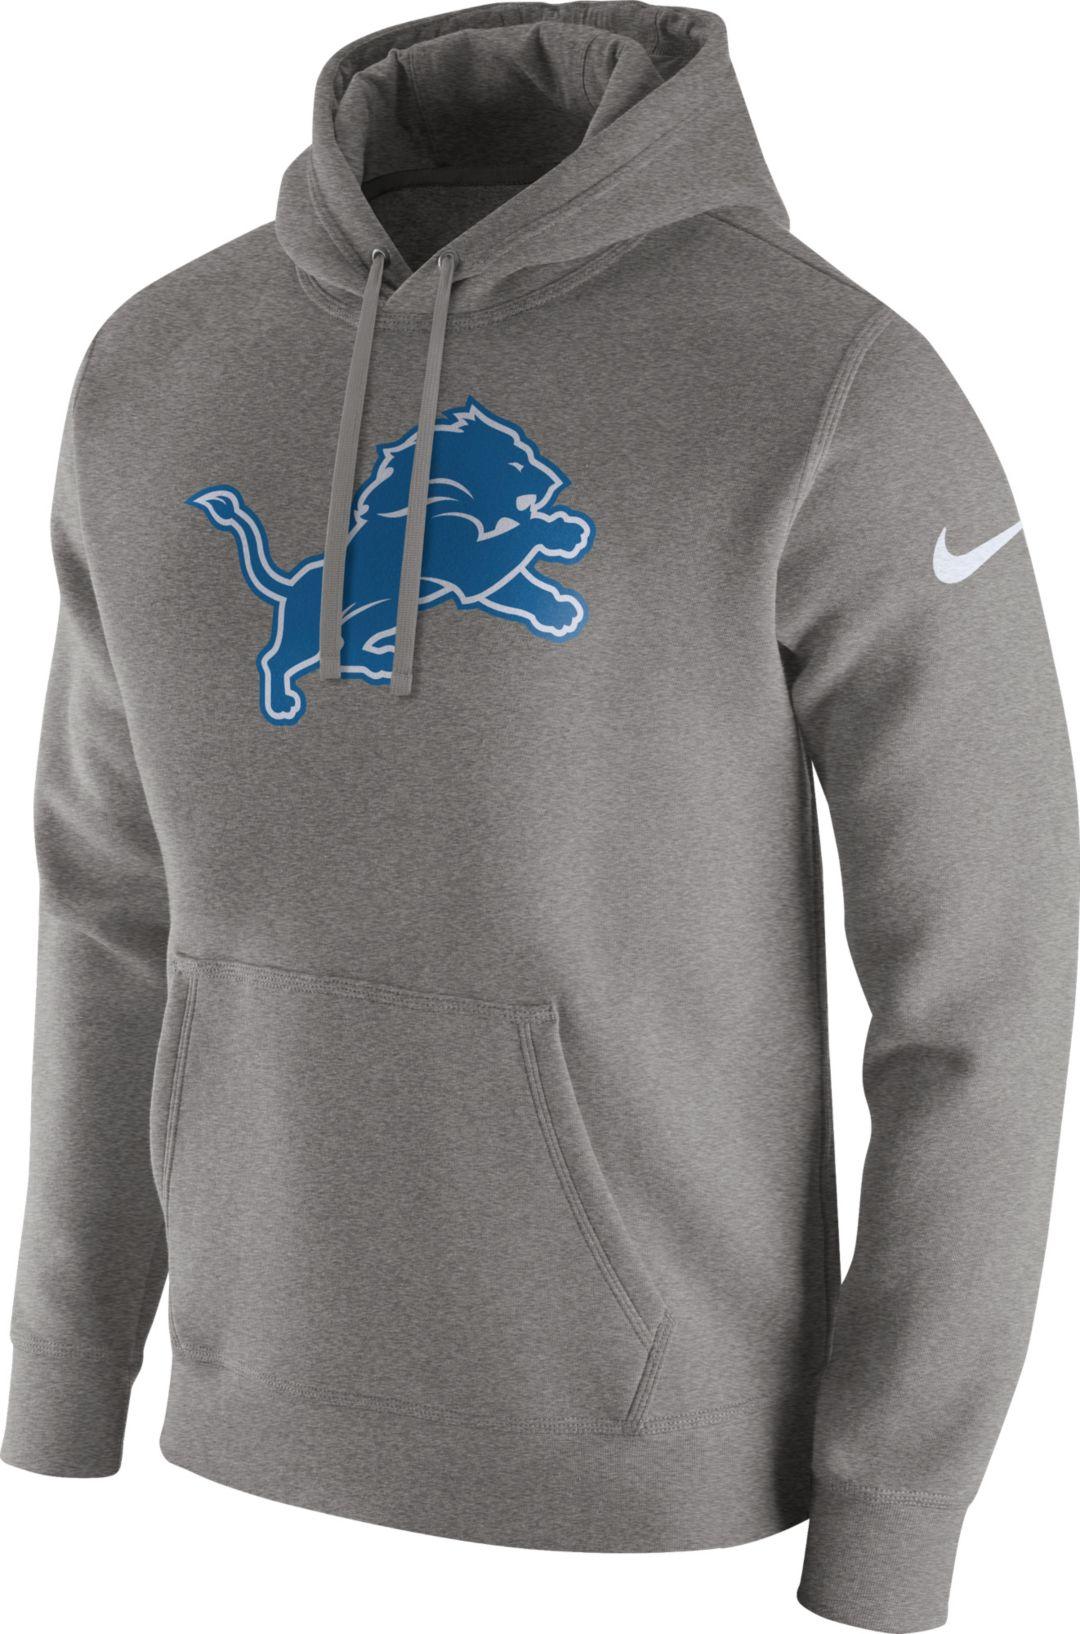 the best attitude df15e db4a0 Nike Men's Detroit Lions Logo Club Grey Hoodie